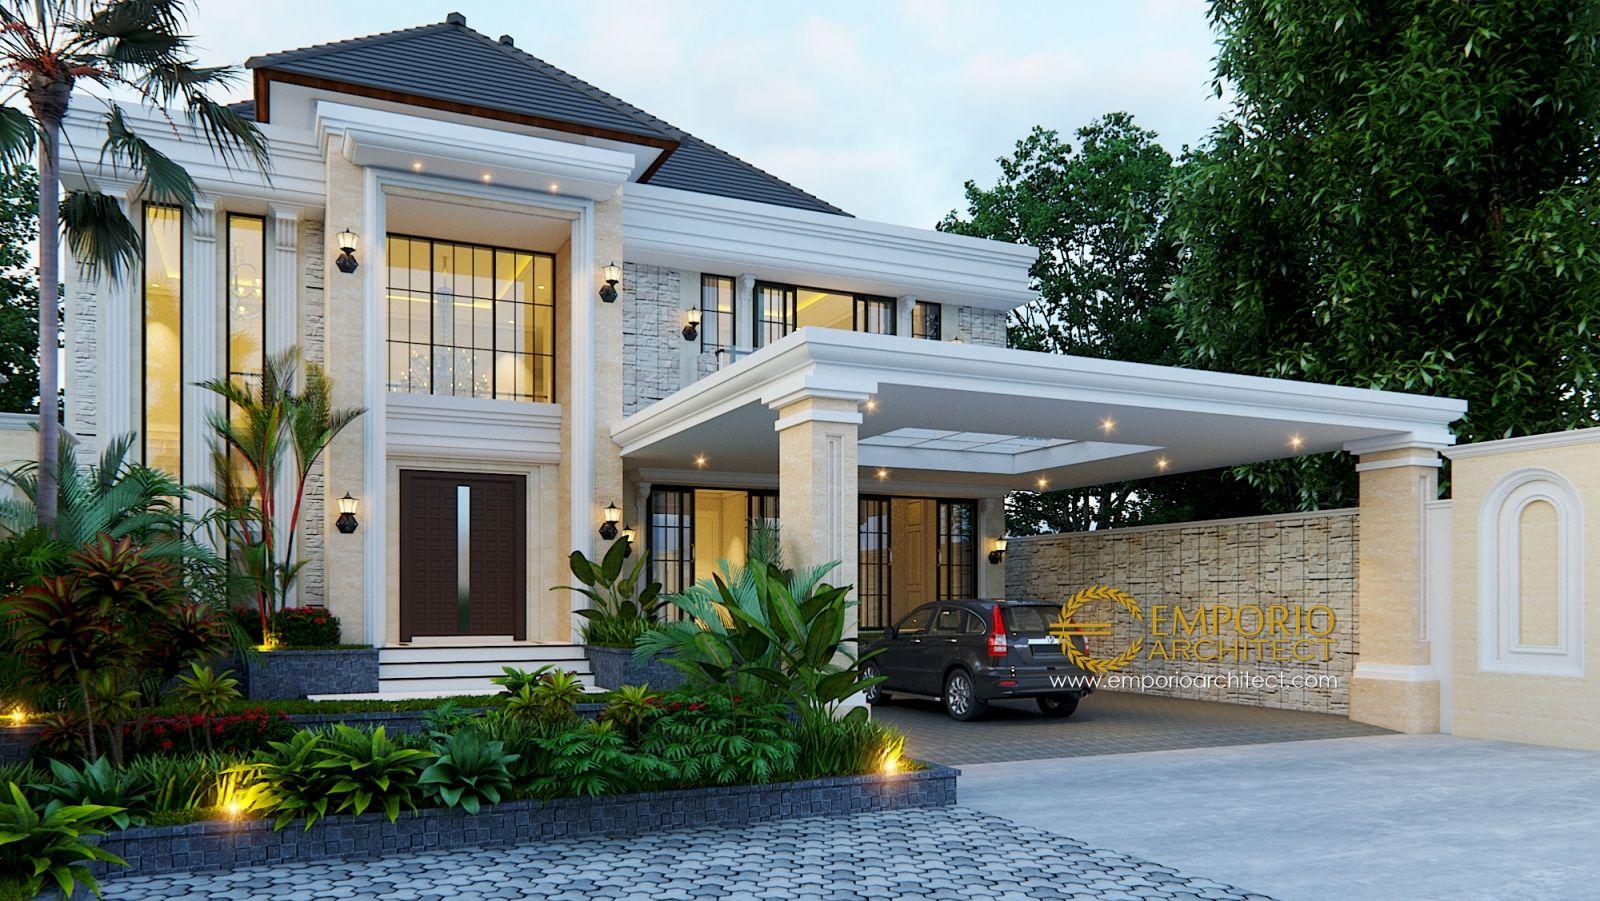 Desain Rumah Bapak Gatot Di Yogyakarta Emporioarchitect